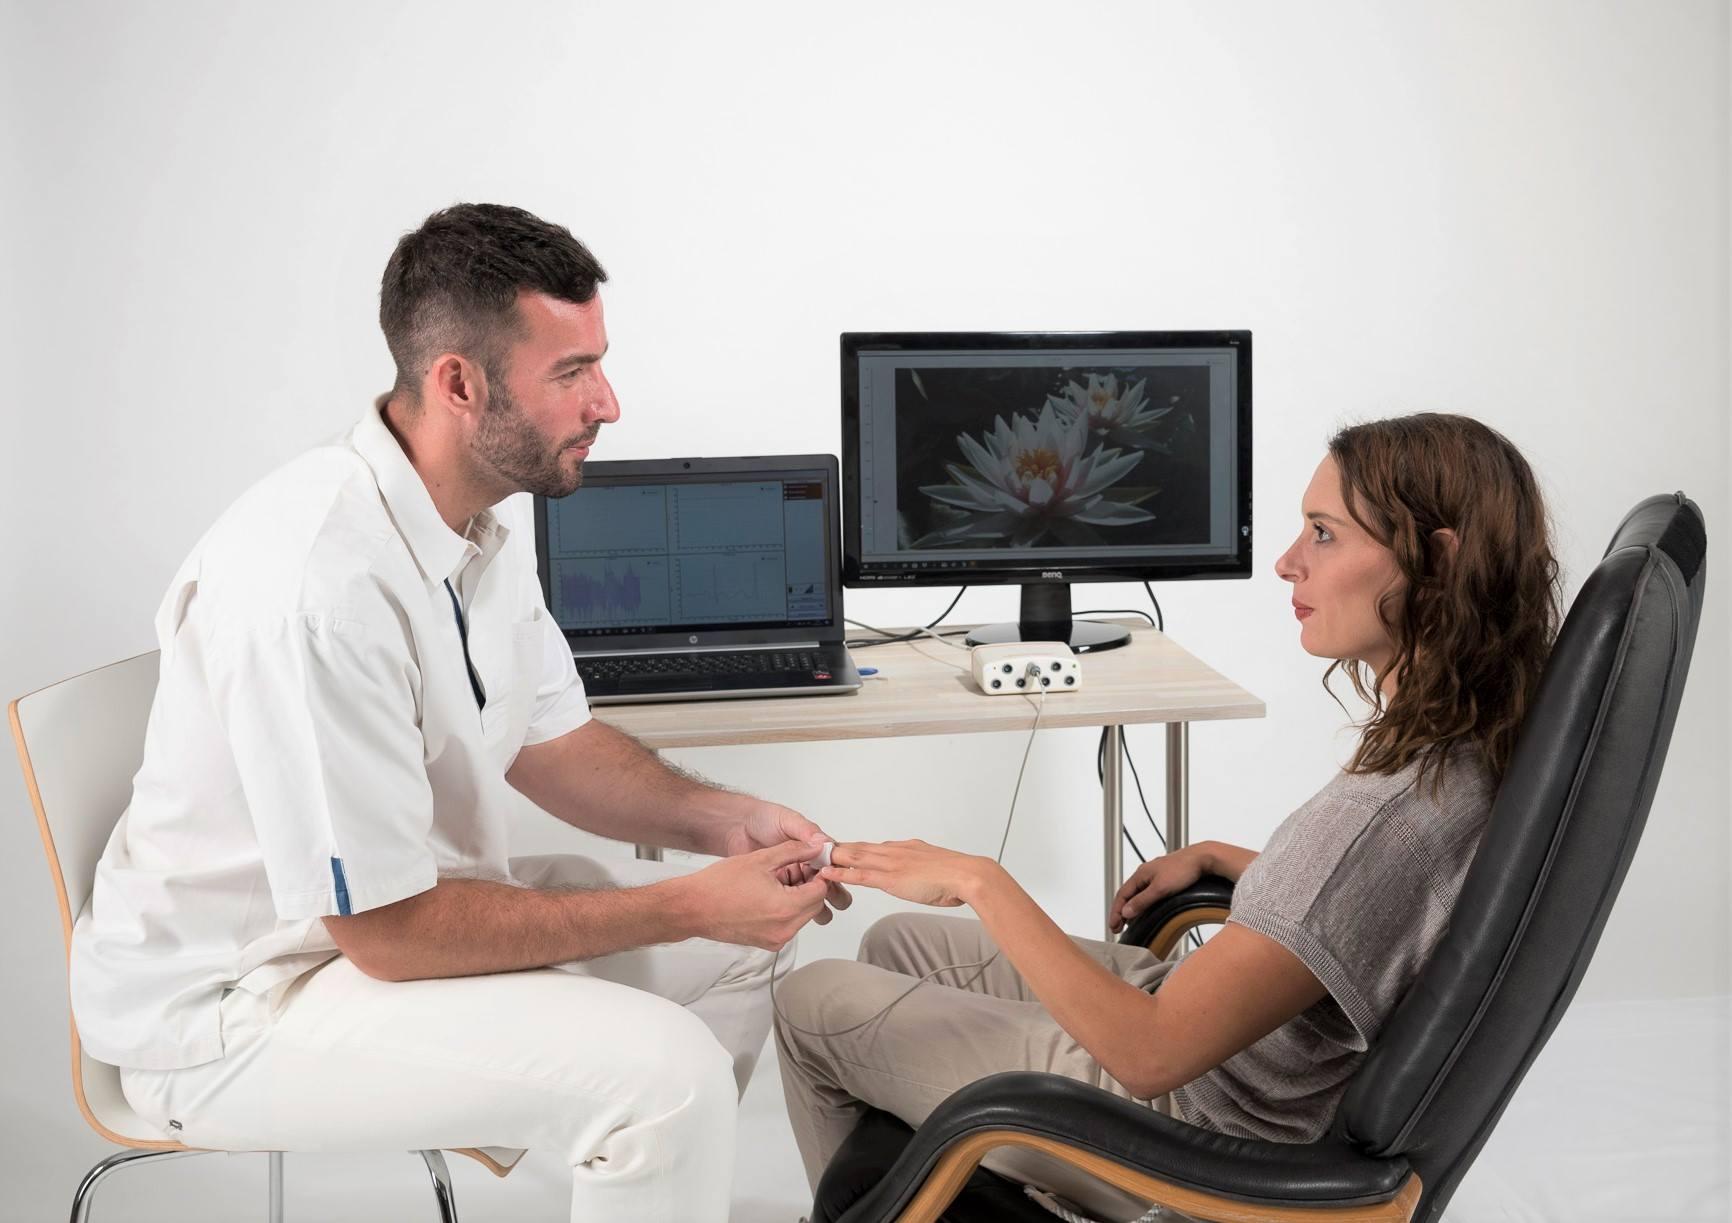 Biofeedback Geräte -Therapeut bringt Klientin den Fingersensor an.